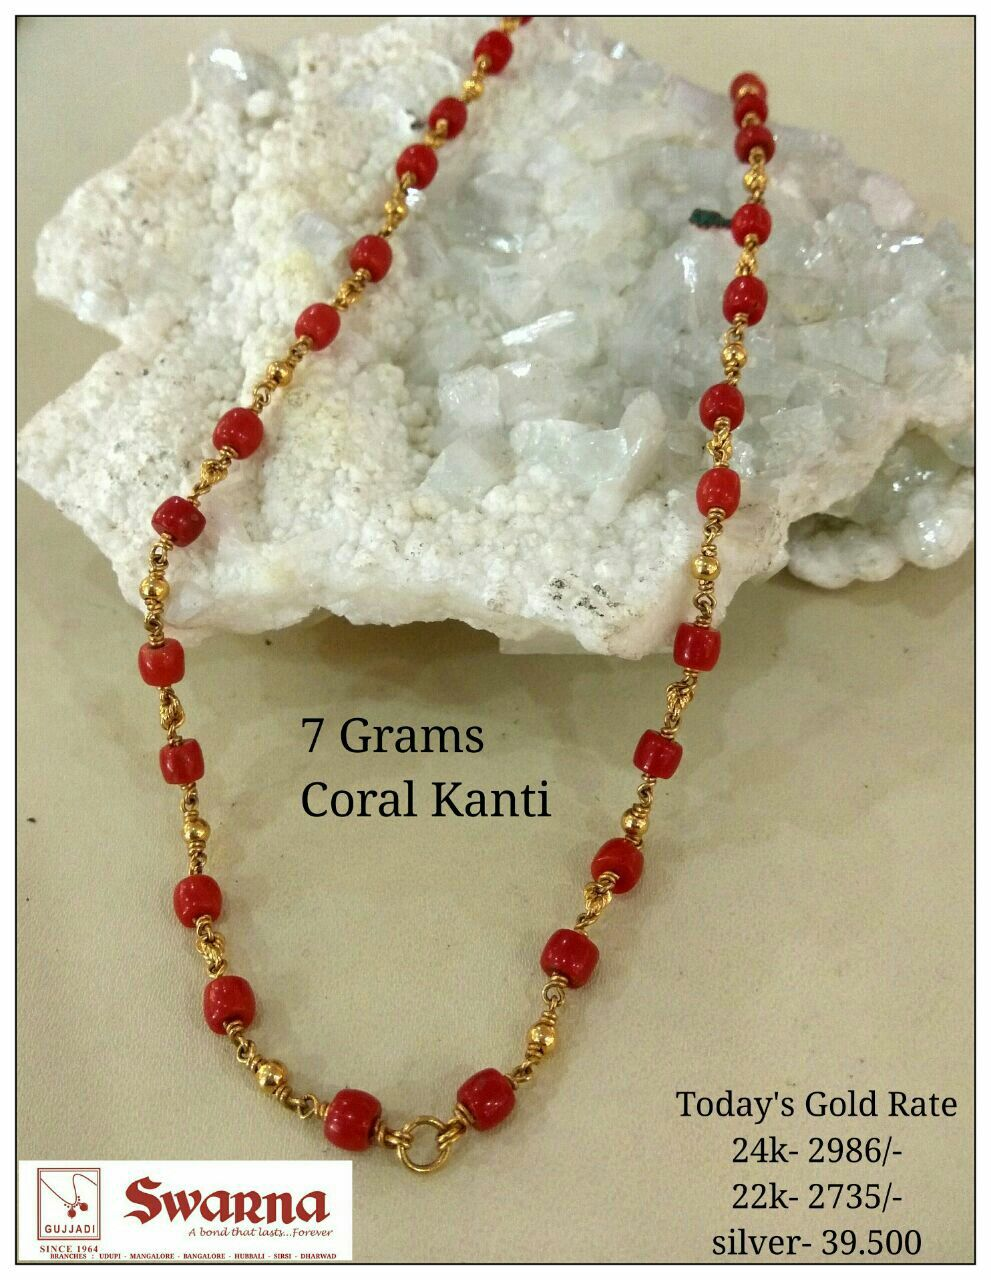 Pin by iyyunni varadarajan on Jewels Pinterest Coral jewelry